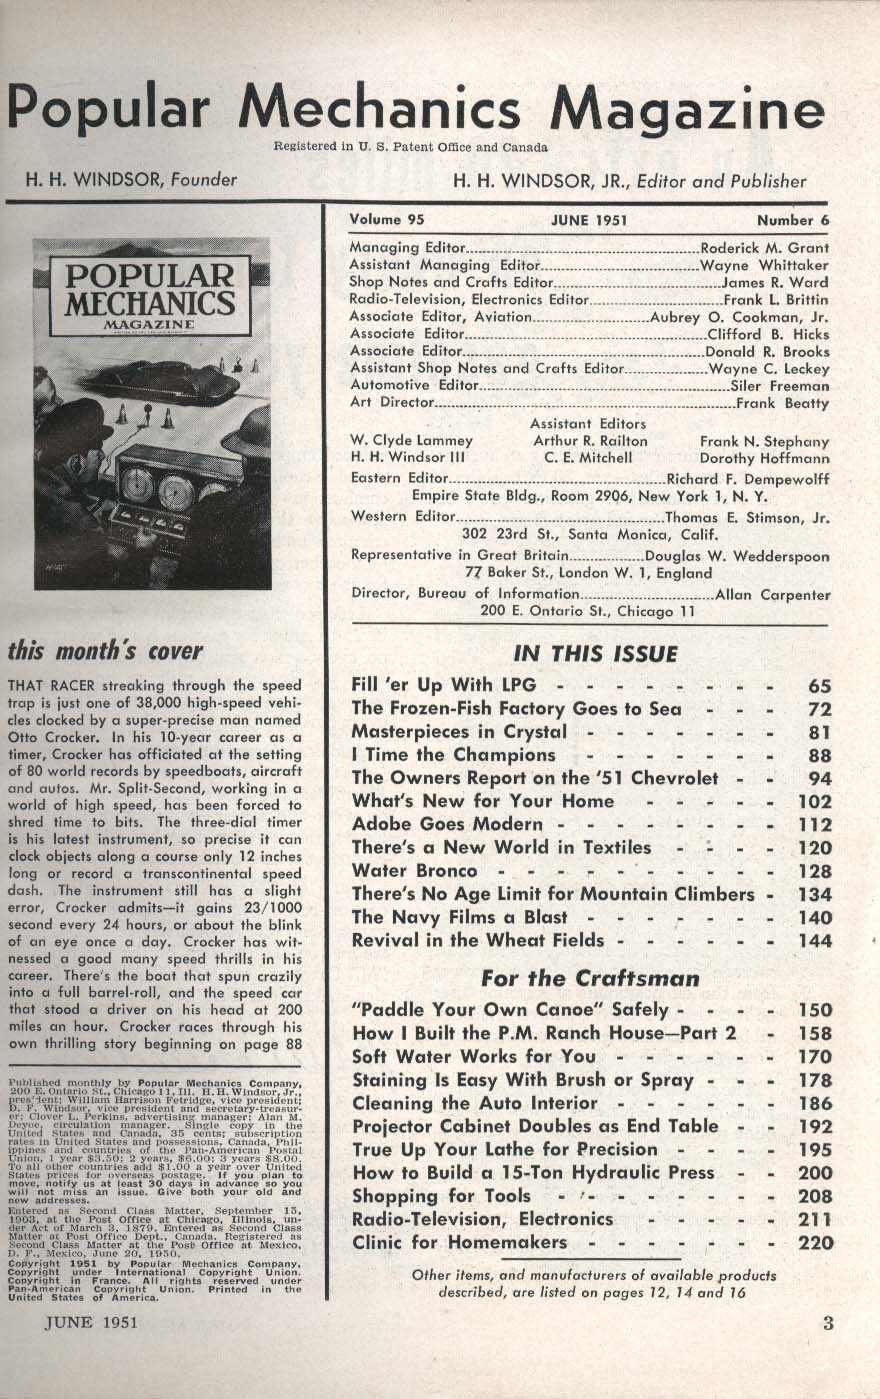 POPULAR MECHANICS Chevrolet Owners Liquefied Petroleum Gas Bowl-o-Matic + 6 1951